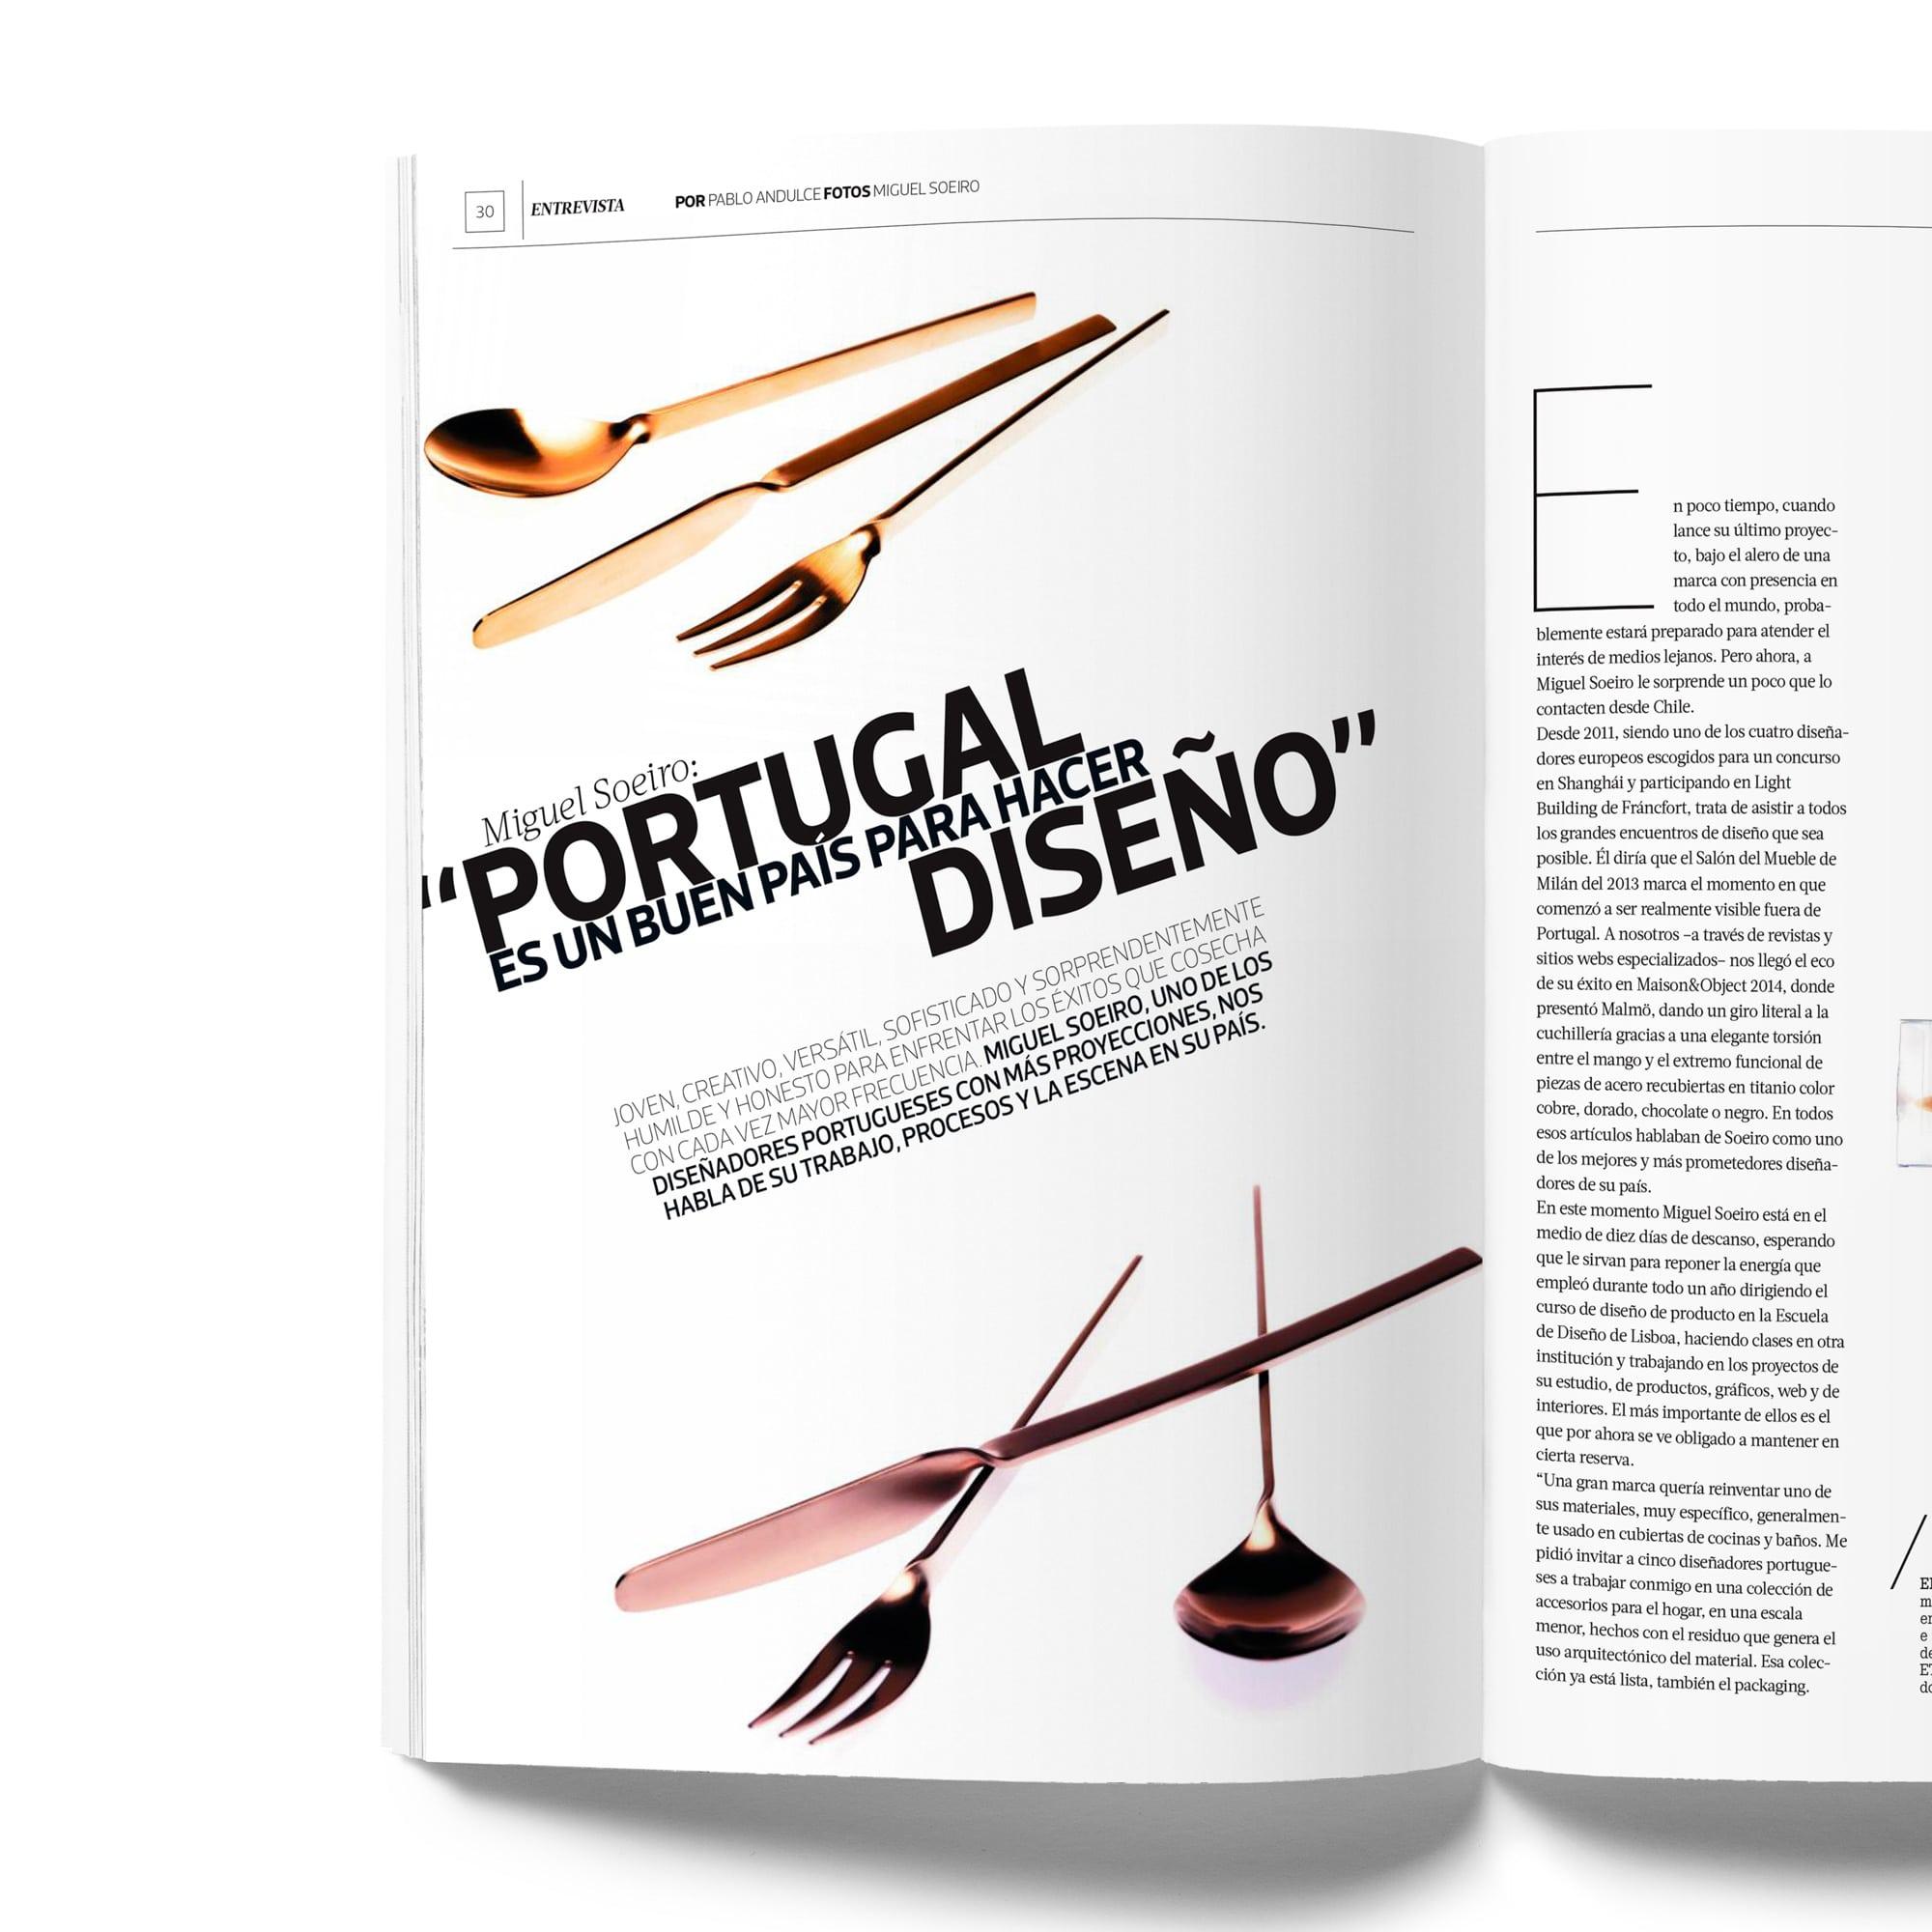 Portugal Diseno